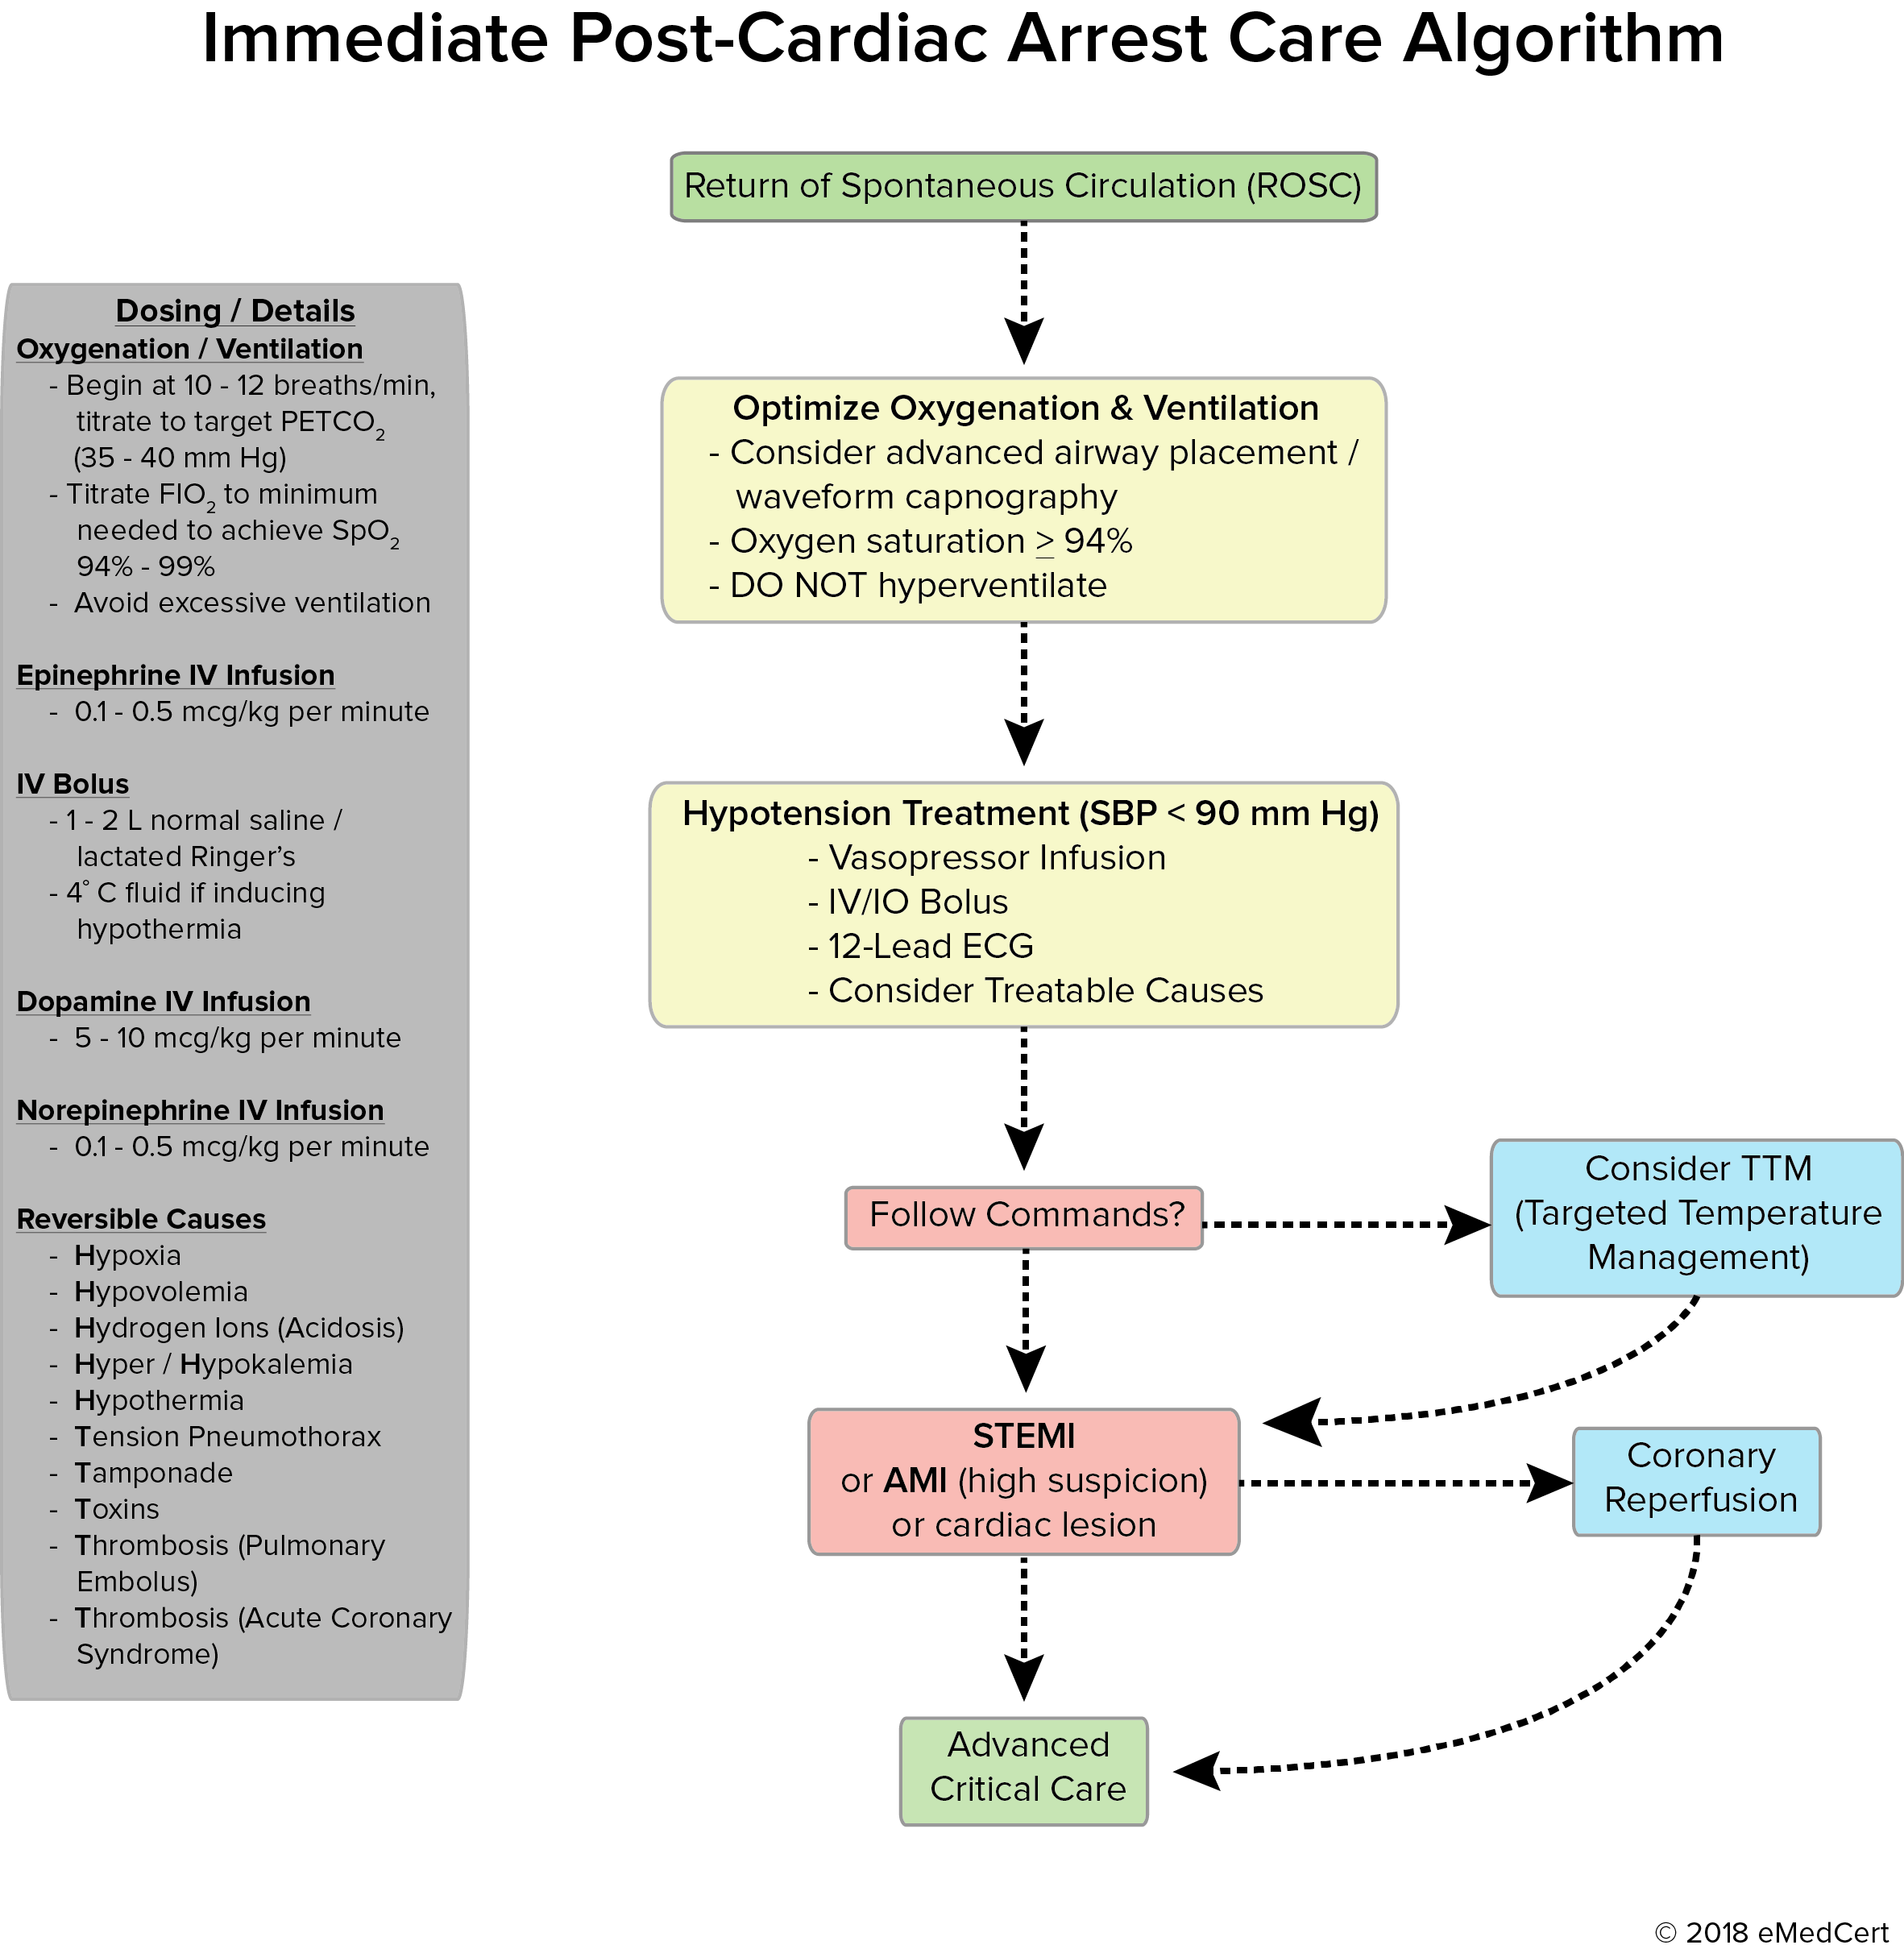 Acls algorithm review immediate post cardiac arrest care algorithm sign up for your acls online course today xflitez Image collections